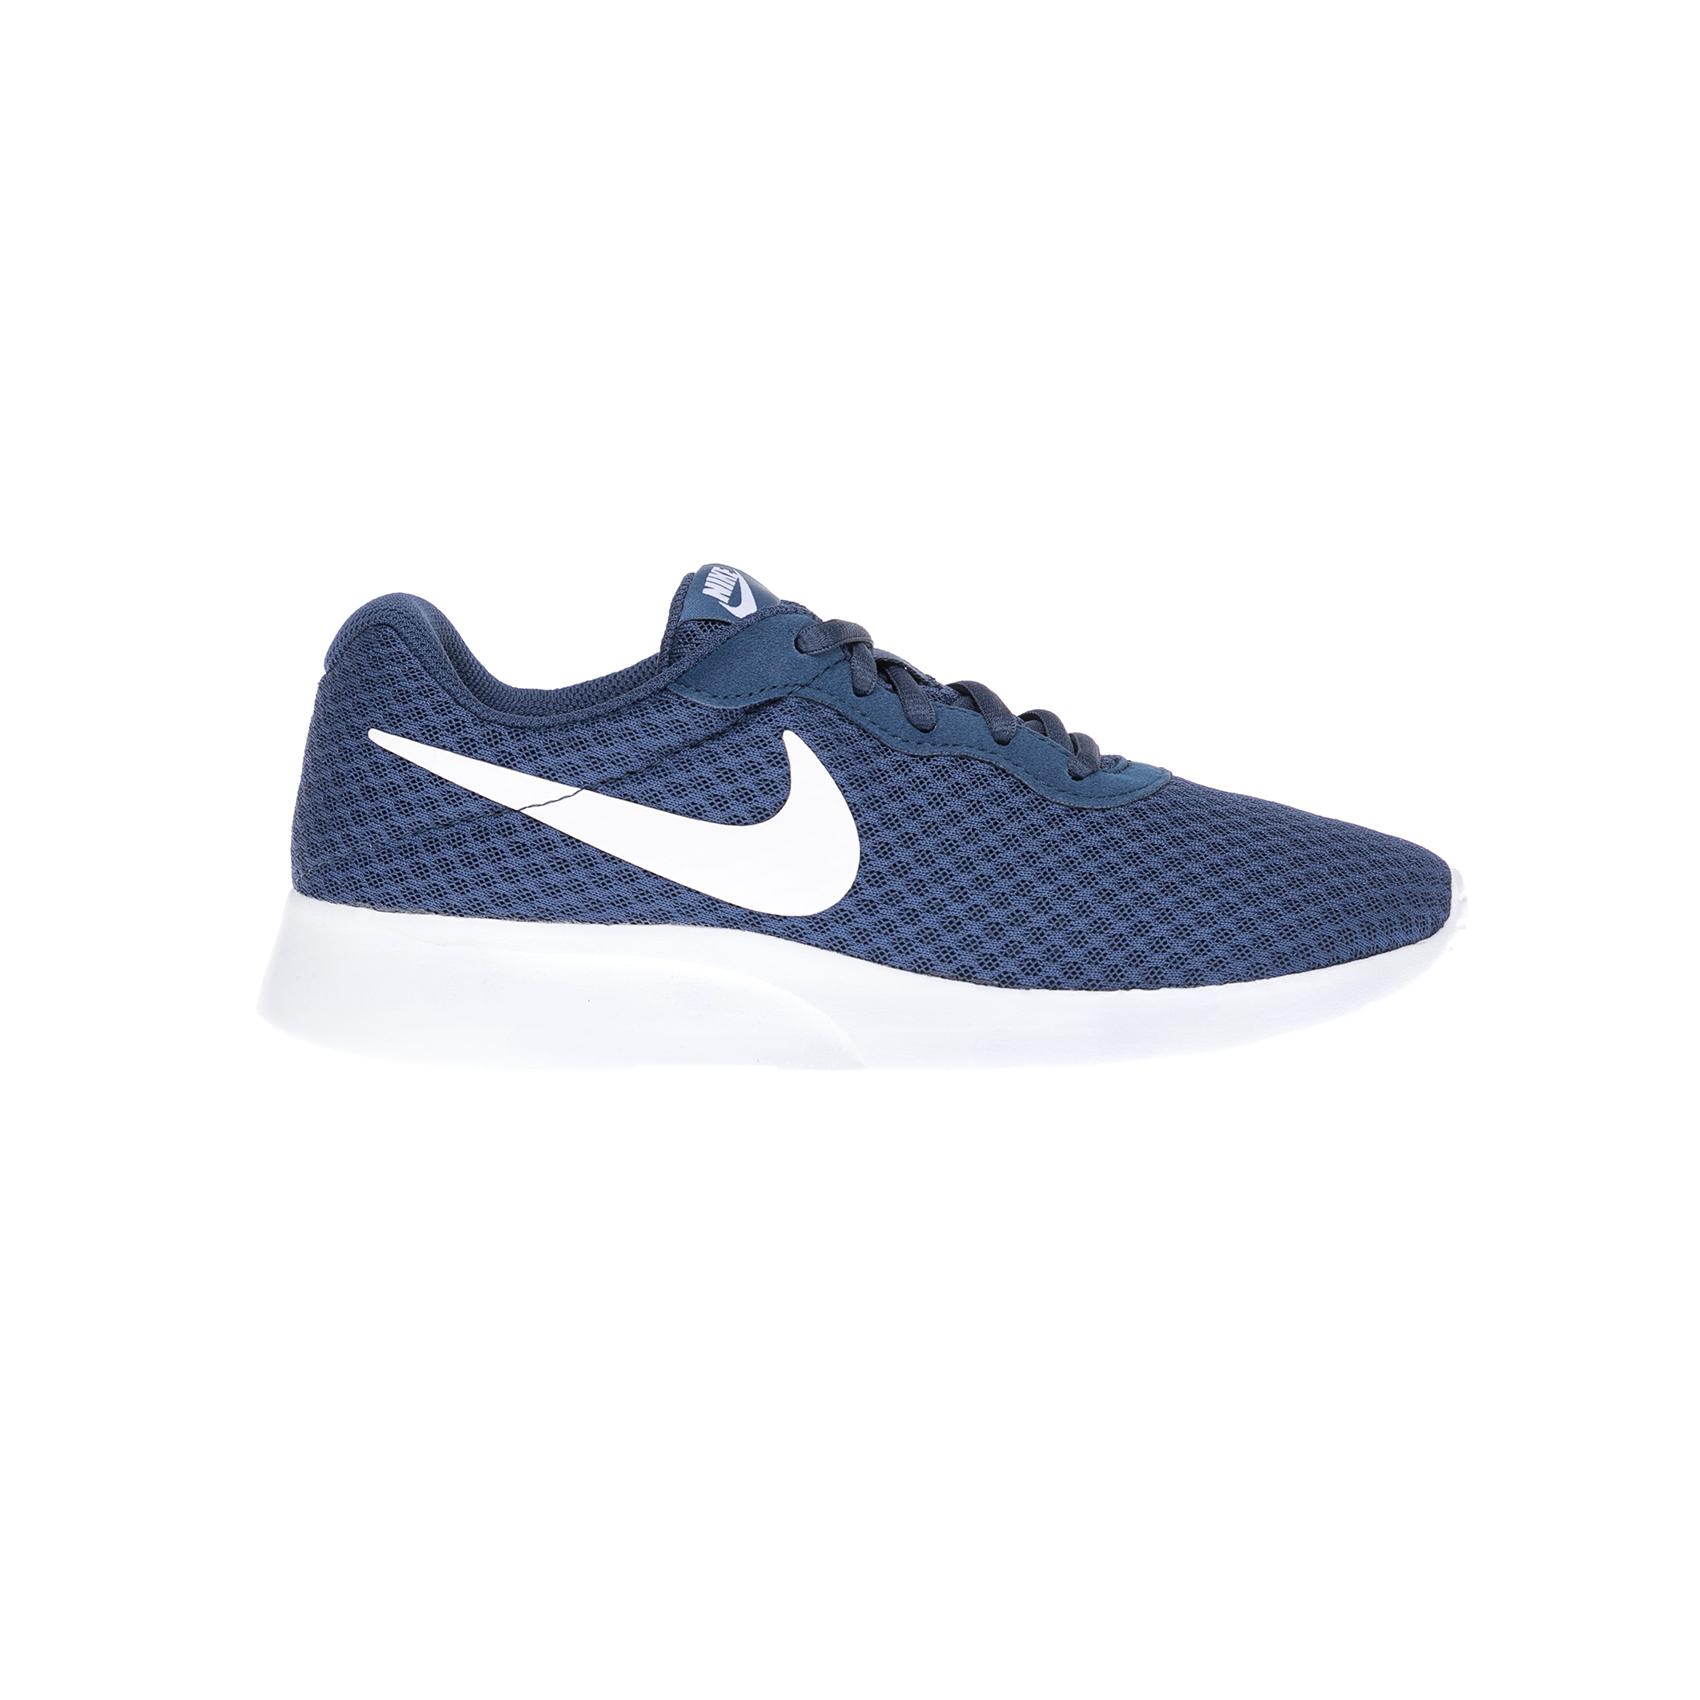 NIKE – Γυναικεία αθλητικά παπούτσια NIKE TANJUN μπλε